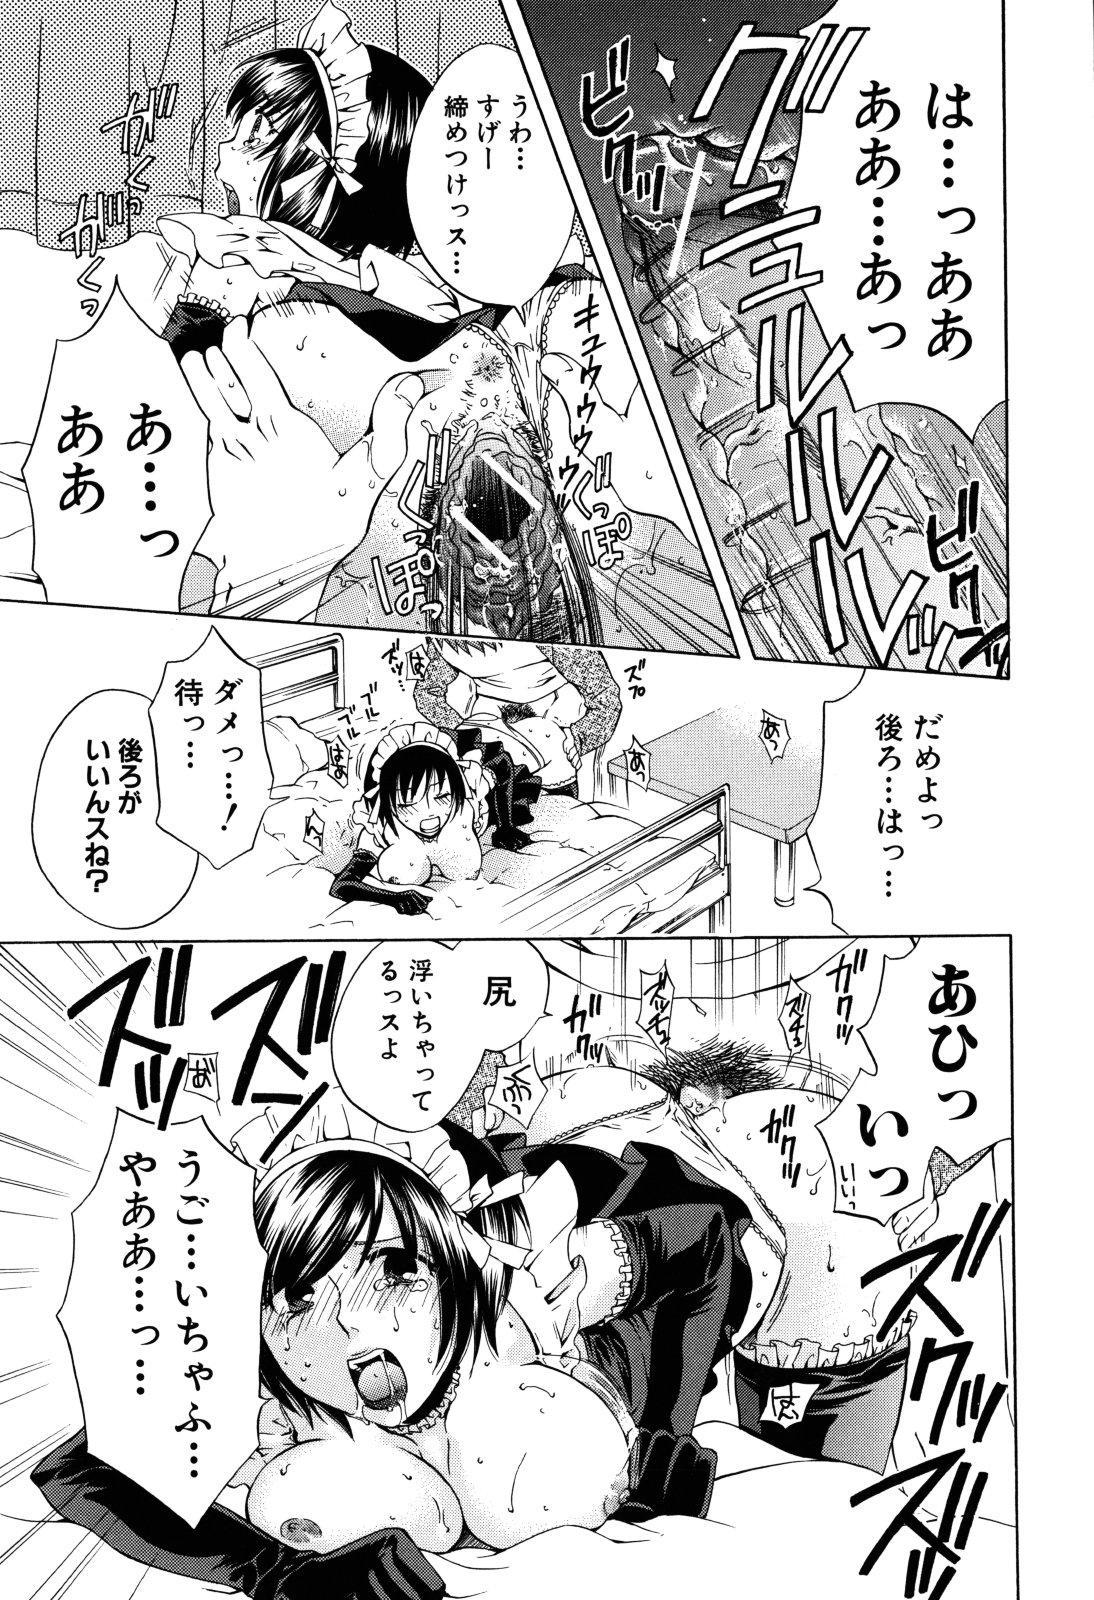 Kanojo ga Ochiru made - She in the depth 112